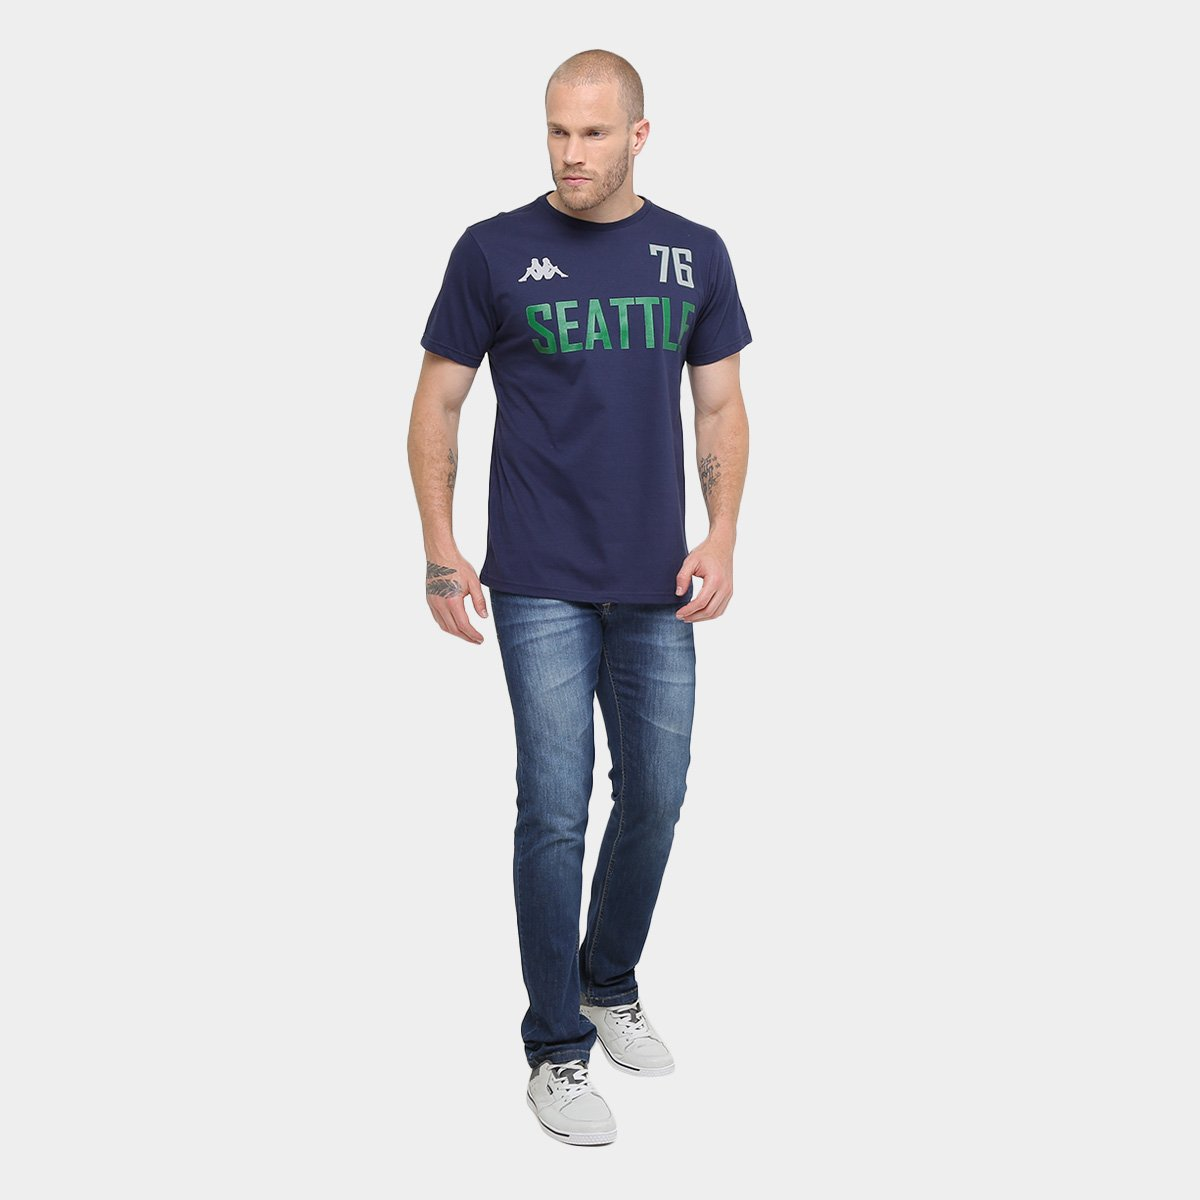 Camiseta Kappa Seattle Masculina - Compre Agora  ce9bb17238da3